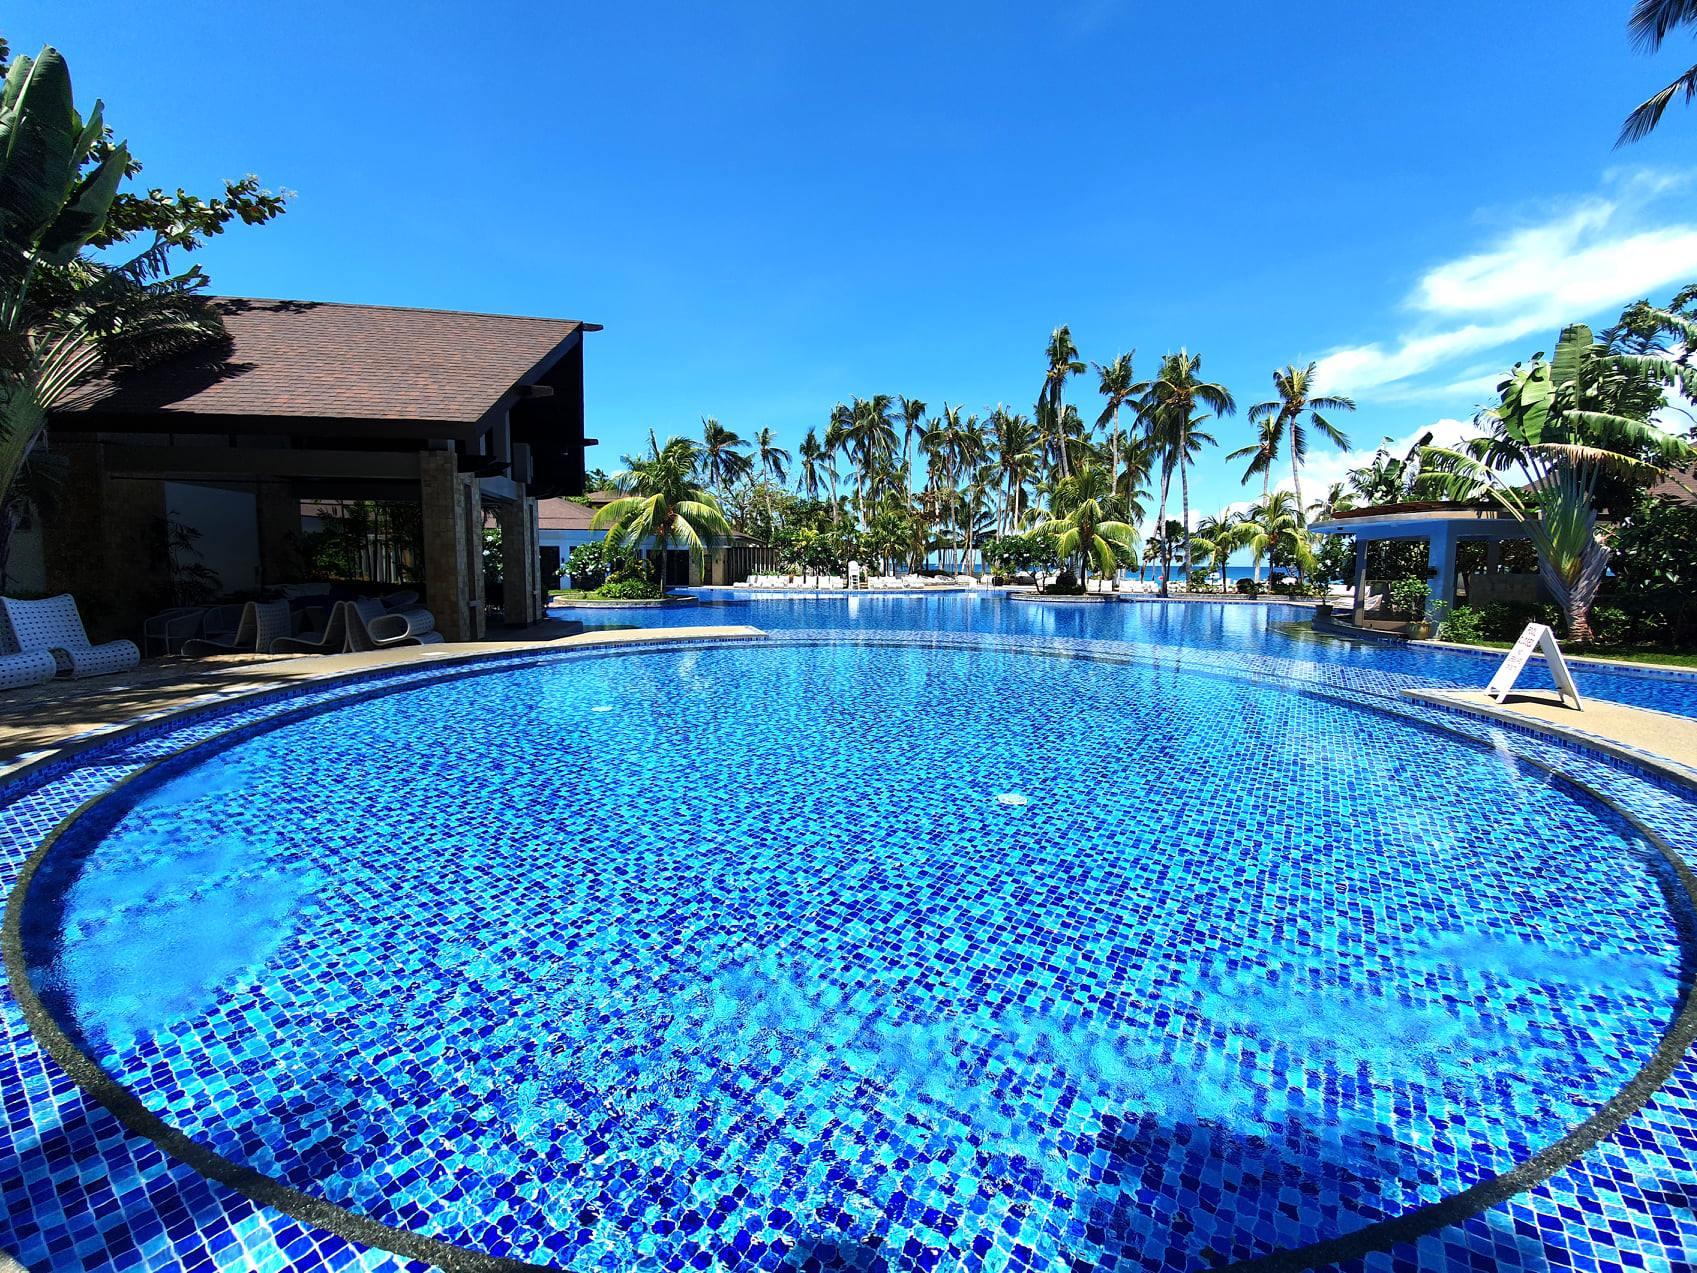 Outdoor Pool at Movenpick Resort & Spa Boracay